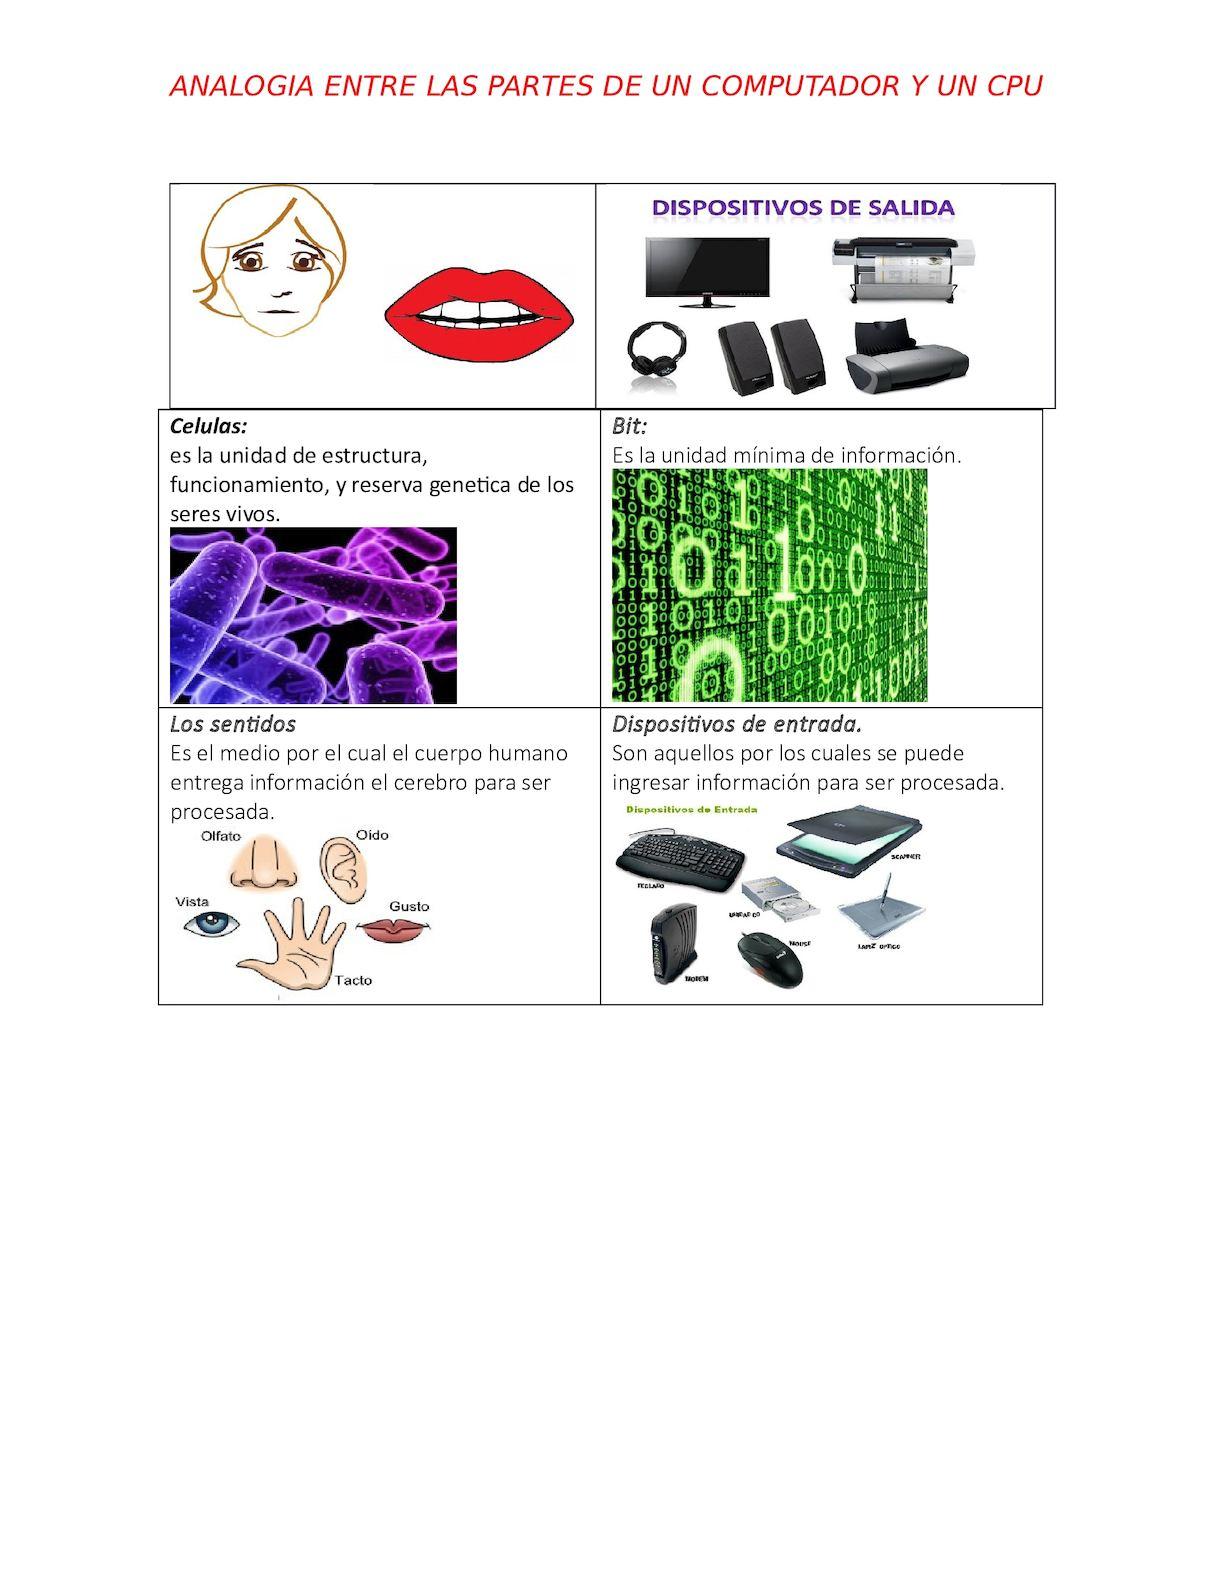 Analogia Calameo Downloader